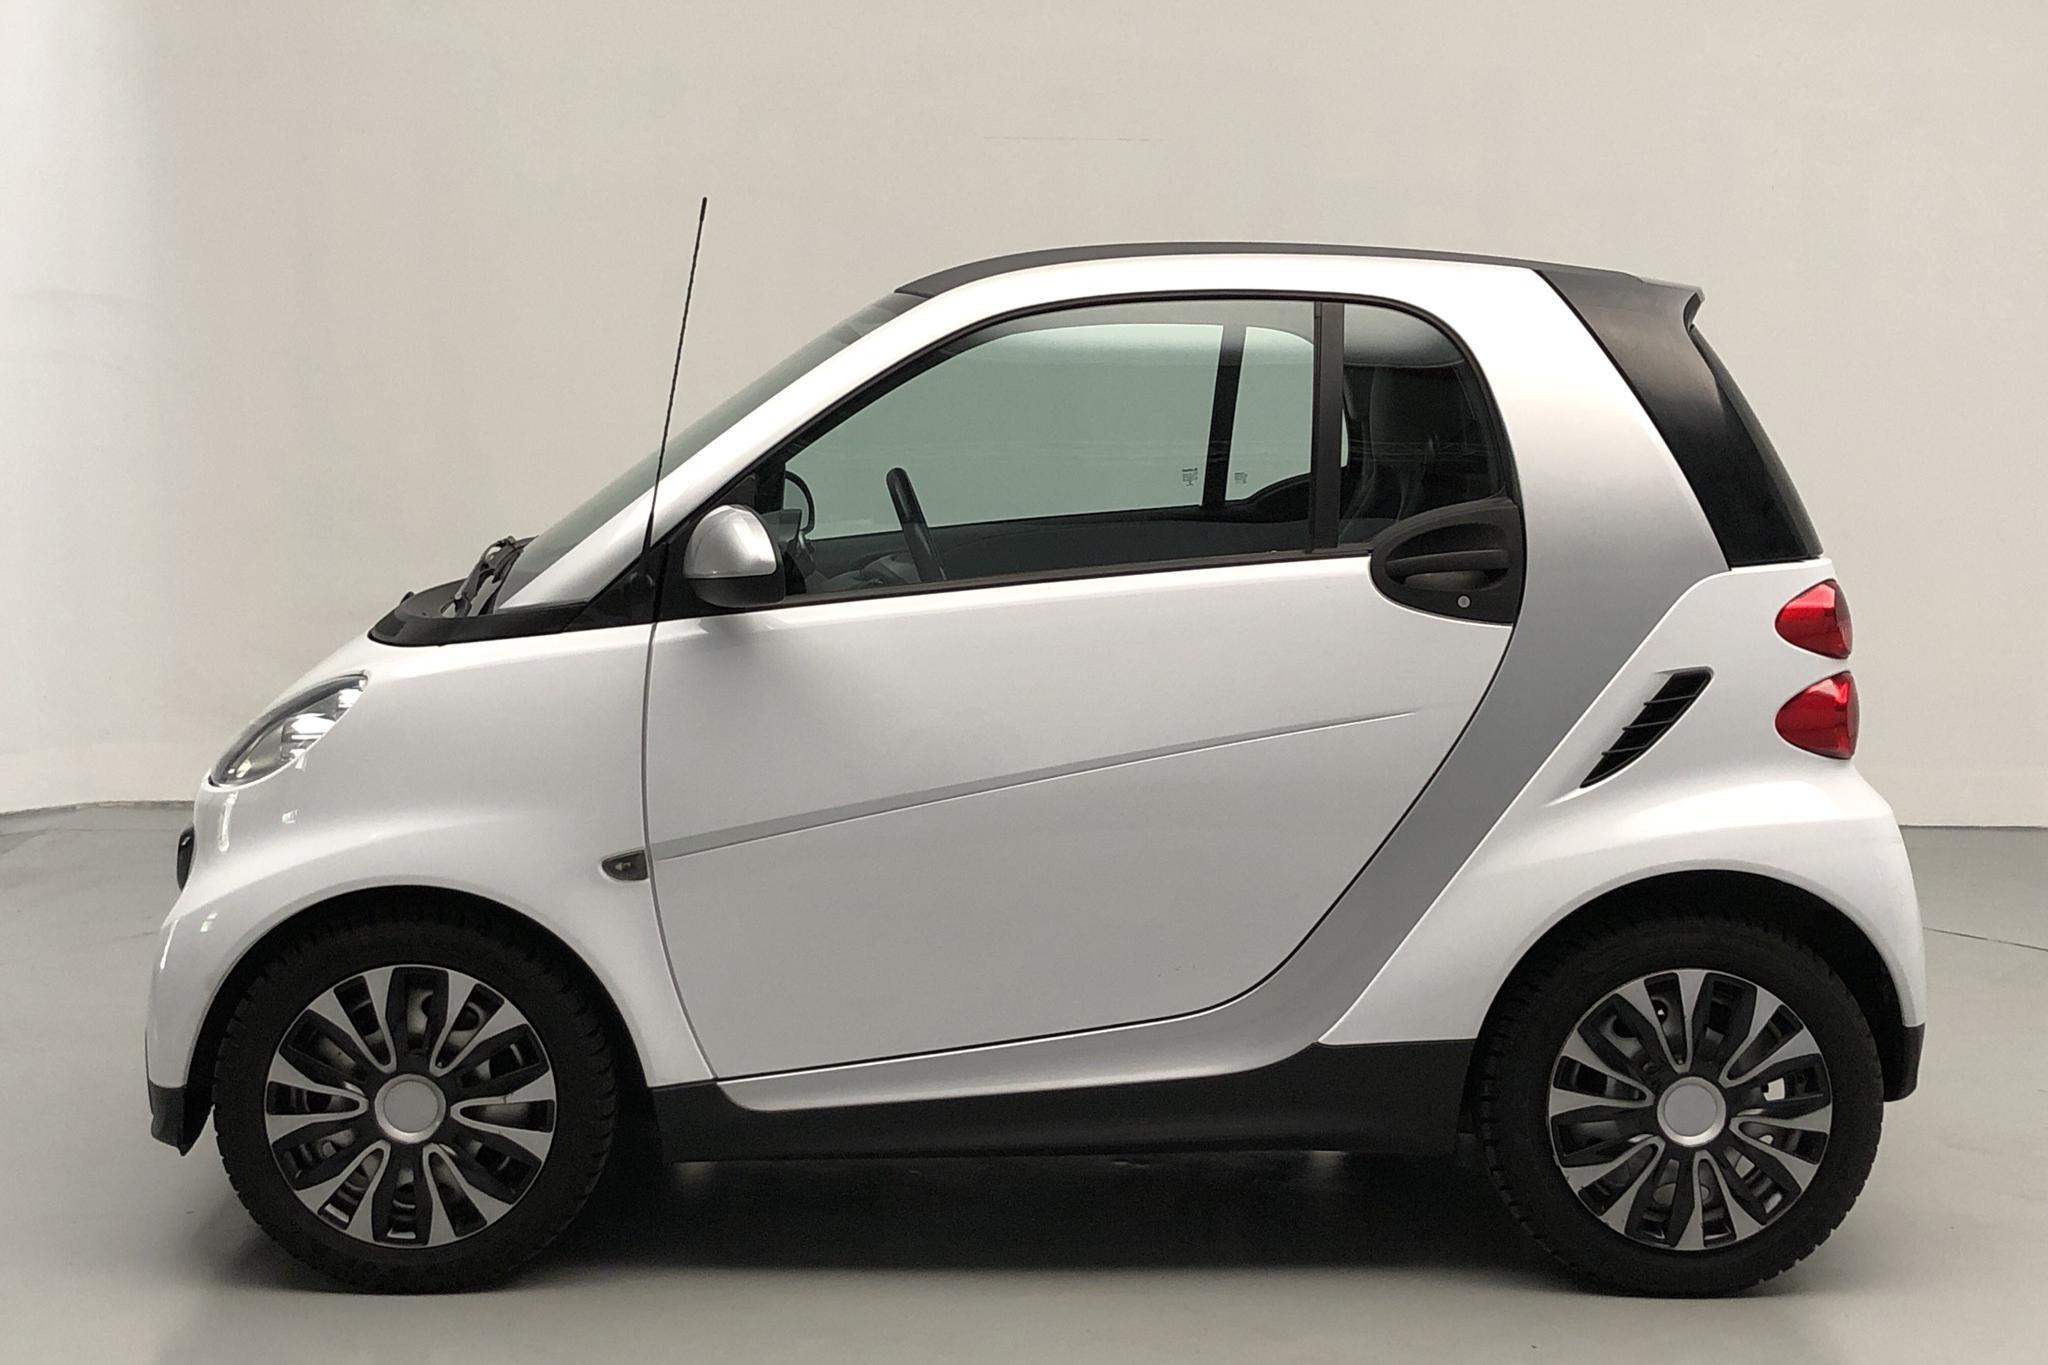 Smart Fortwo II 1.0 mhd Coupé (61hk) - 5 756 mil - Automat - vit - 2014